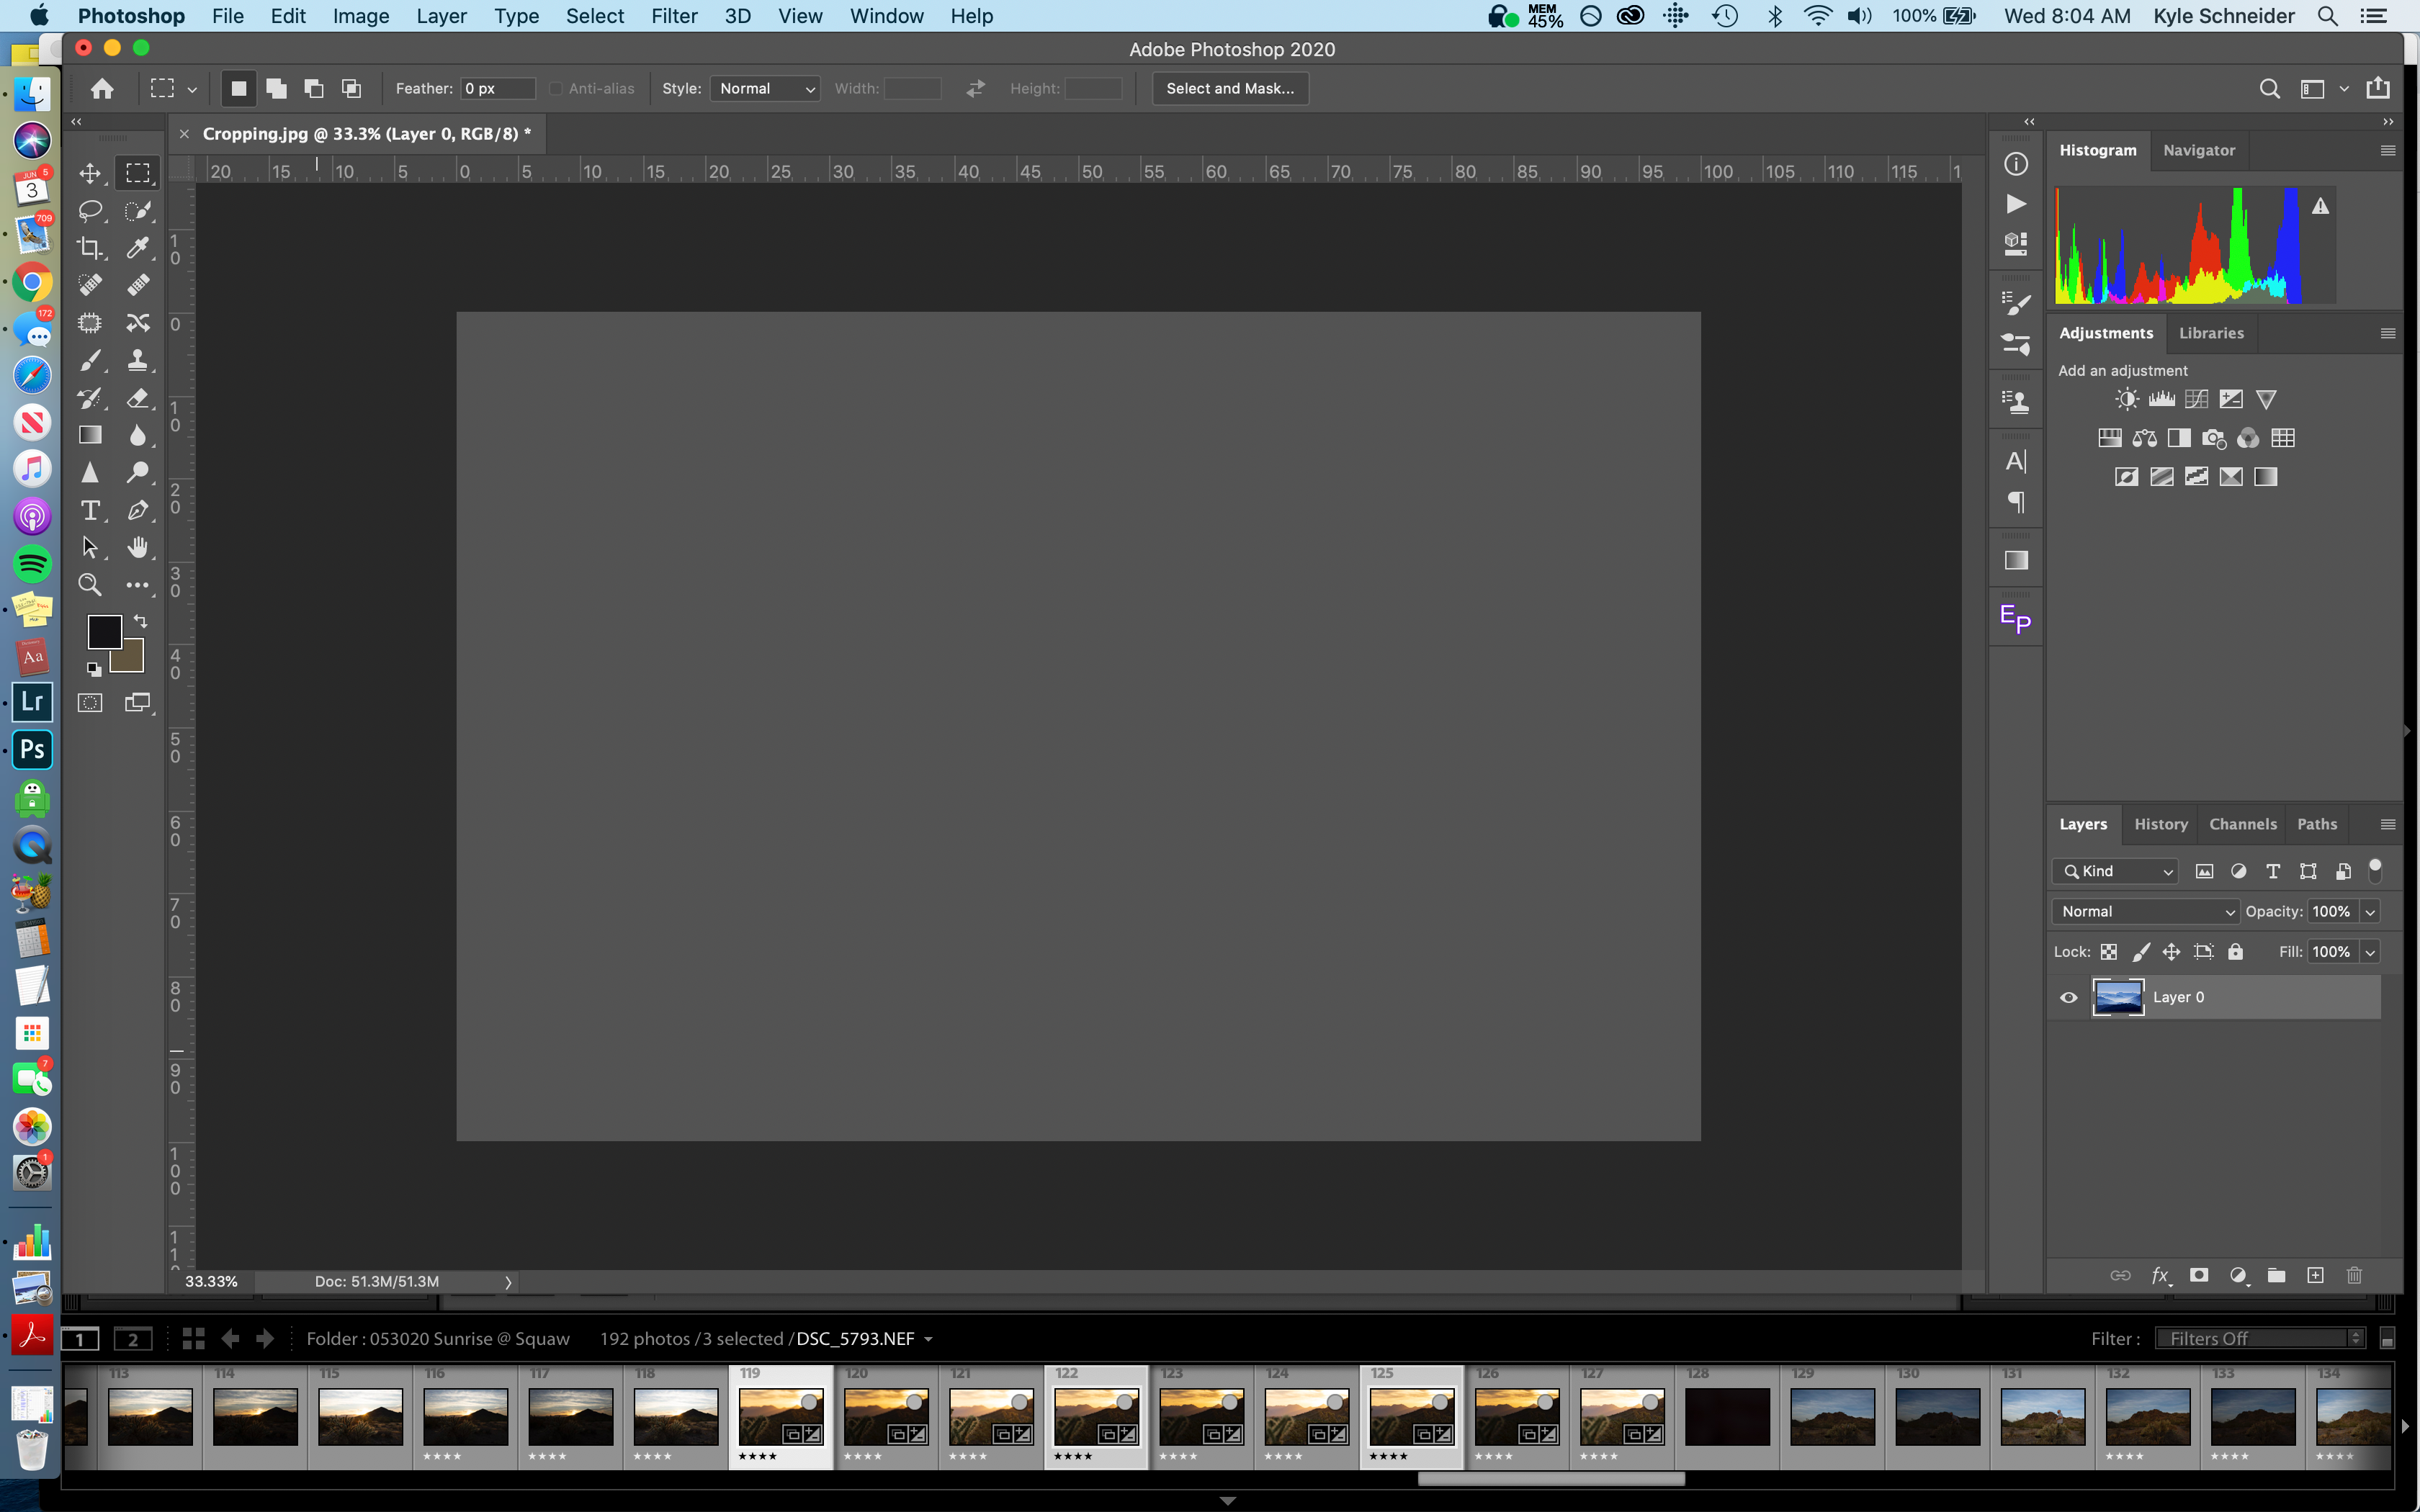 Adobe Photoshop Logiciel - 3